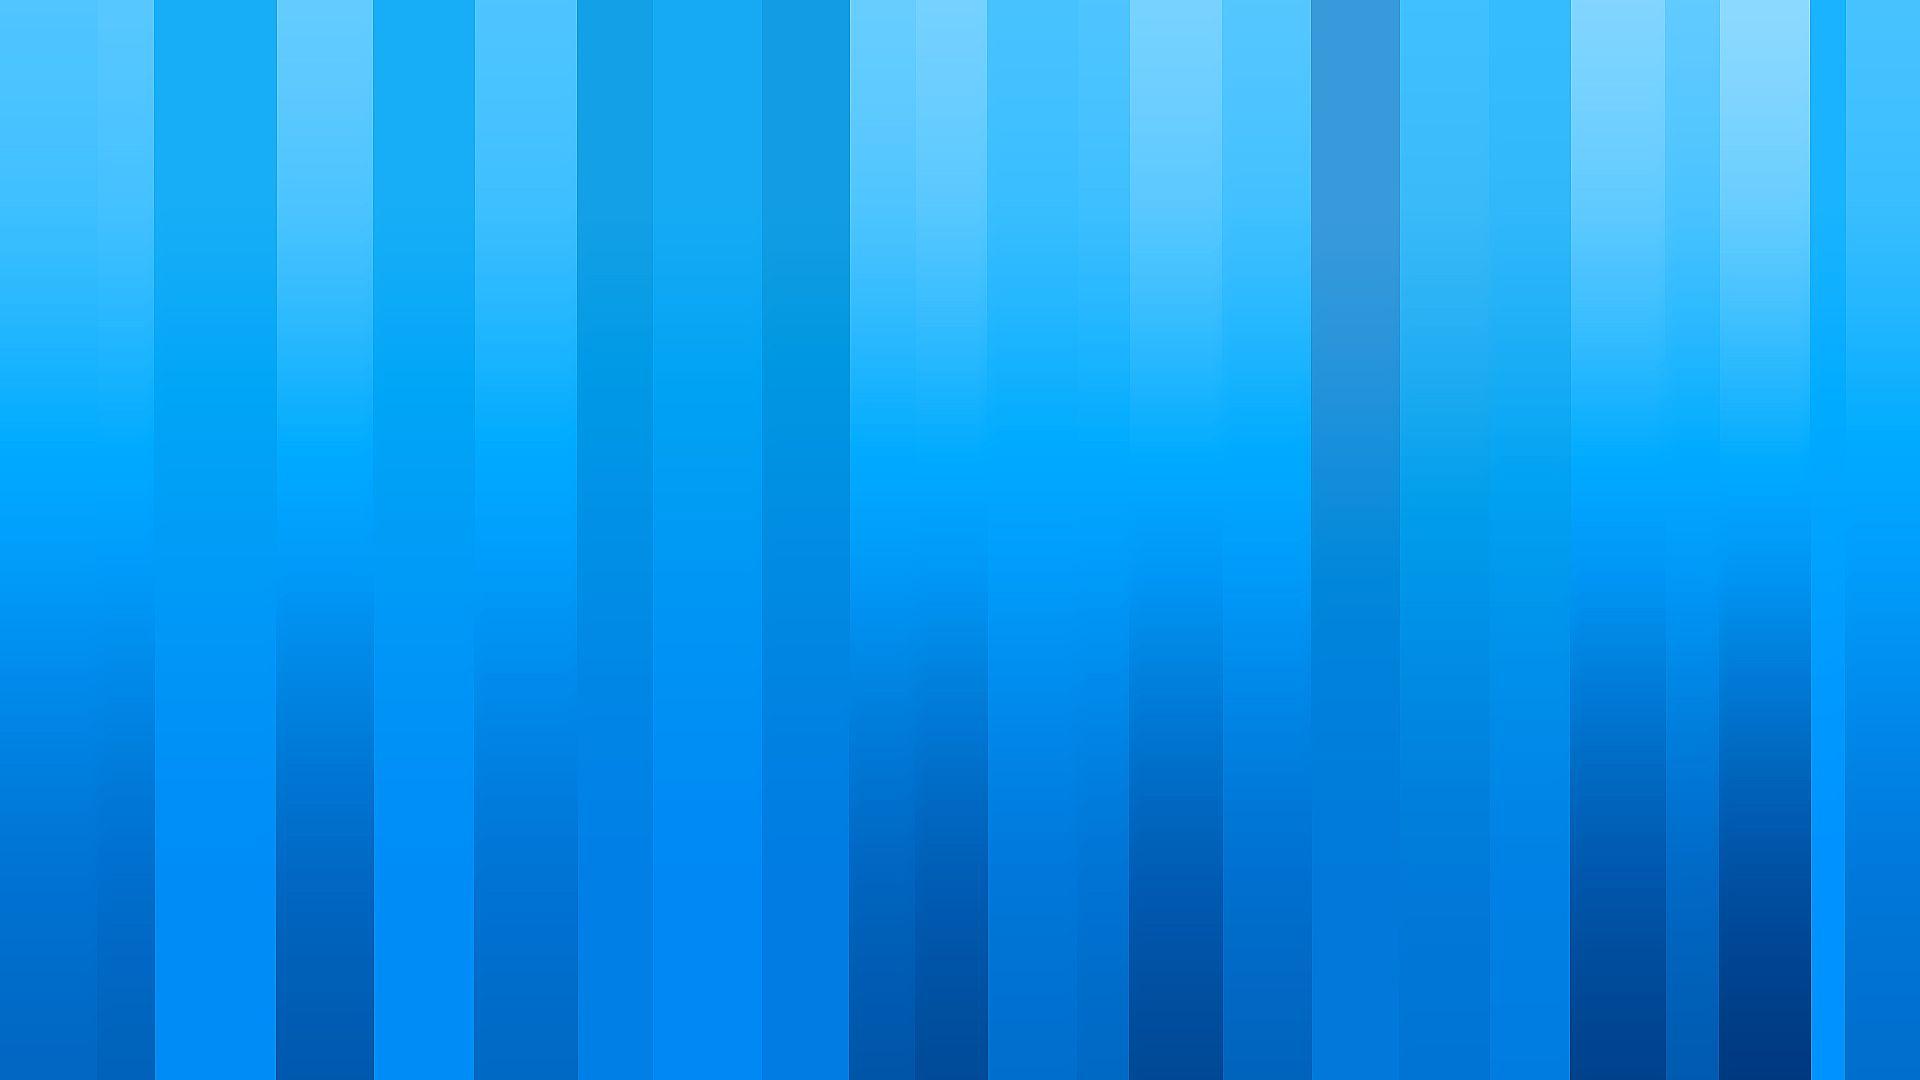 Blue Line wallpaper free